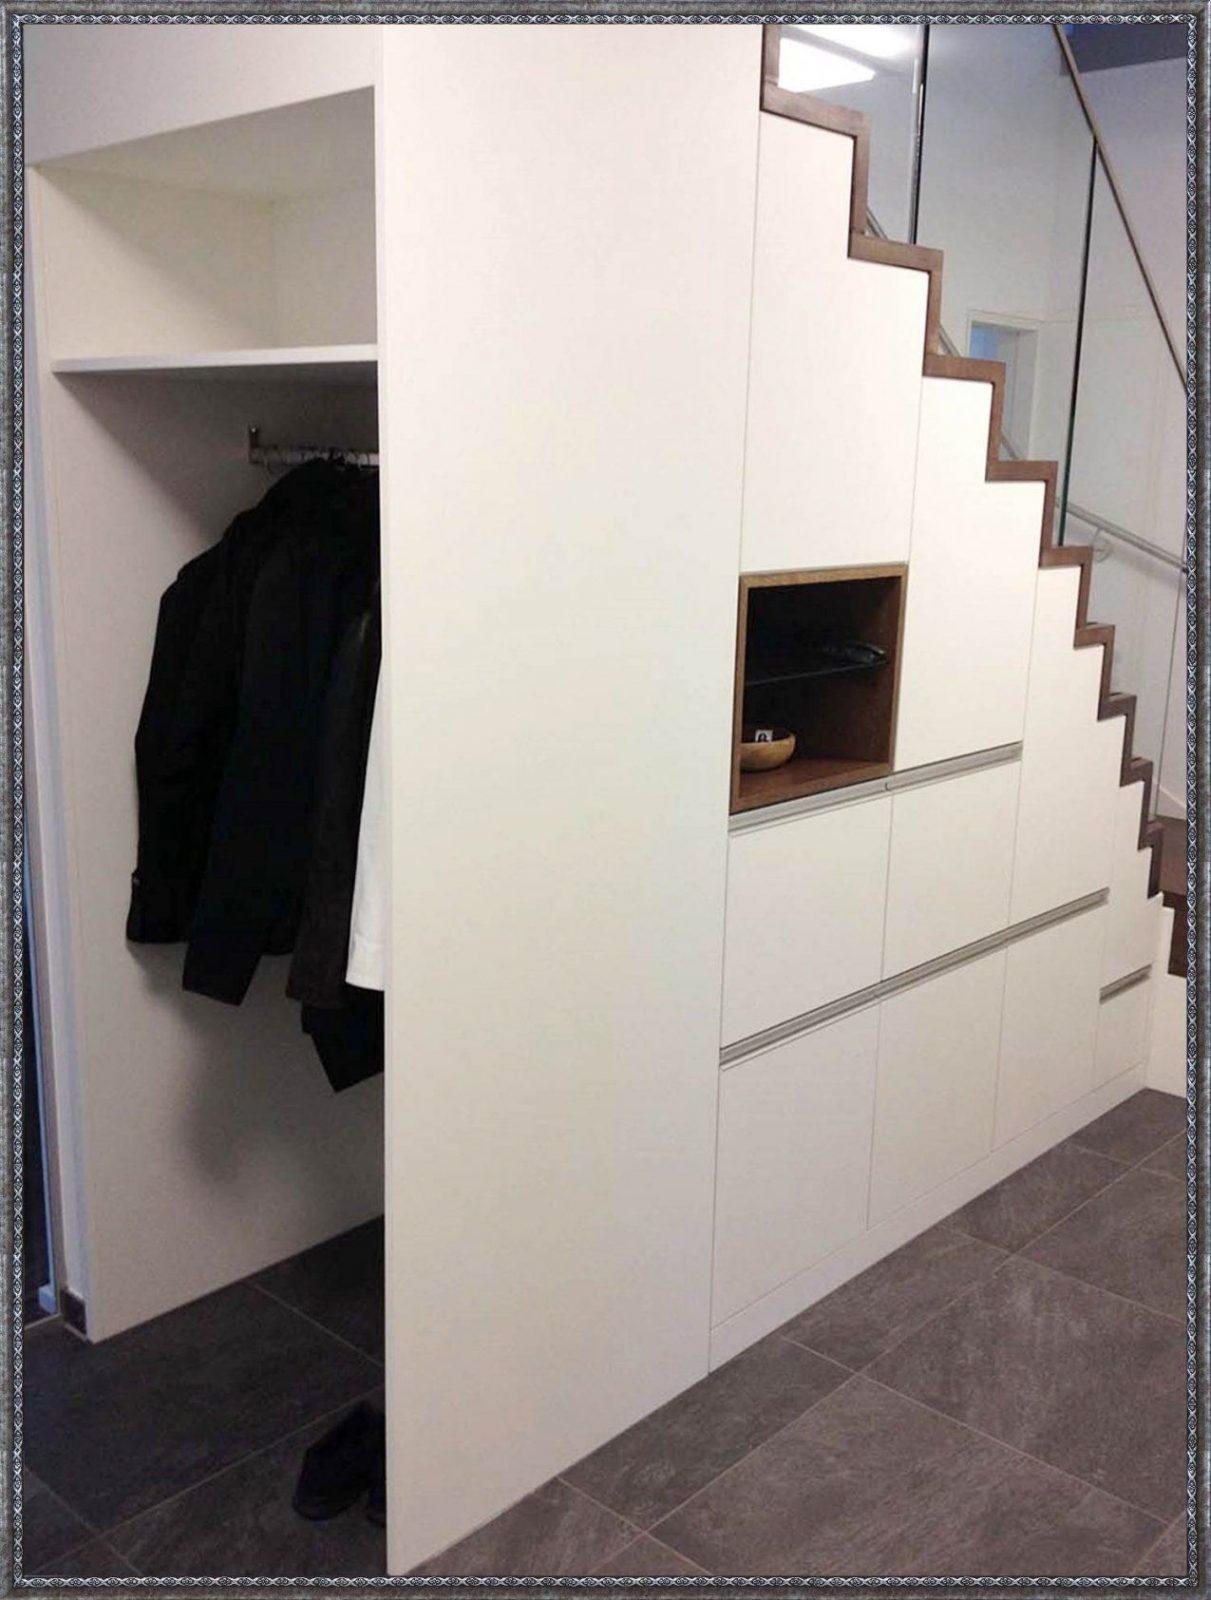 schrank unter treppe ikea inspirierend wand betreffend schrank unter von stauraum unter treppe. Black Bedroom Furniture Sets. Home Design Ideas